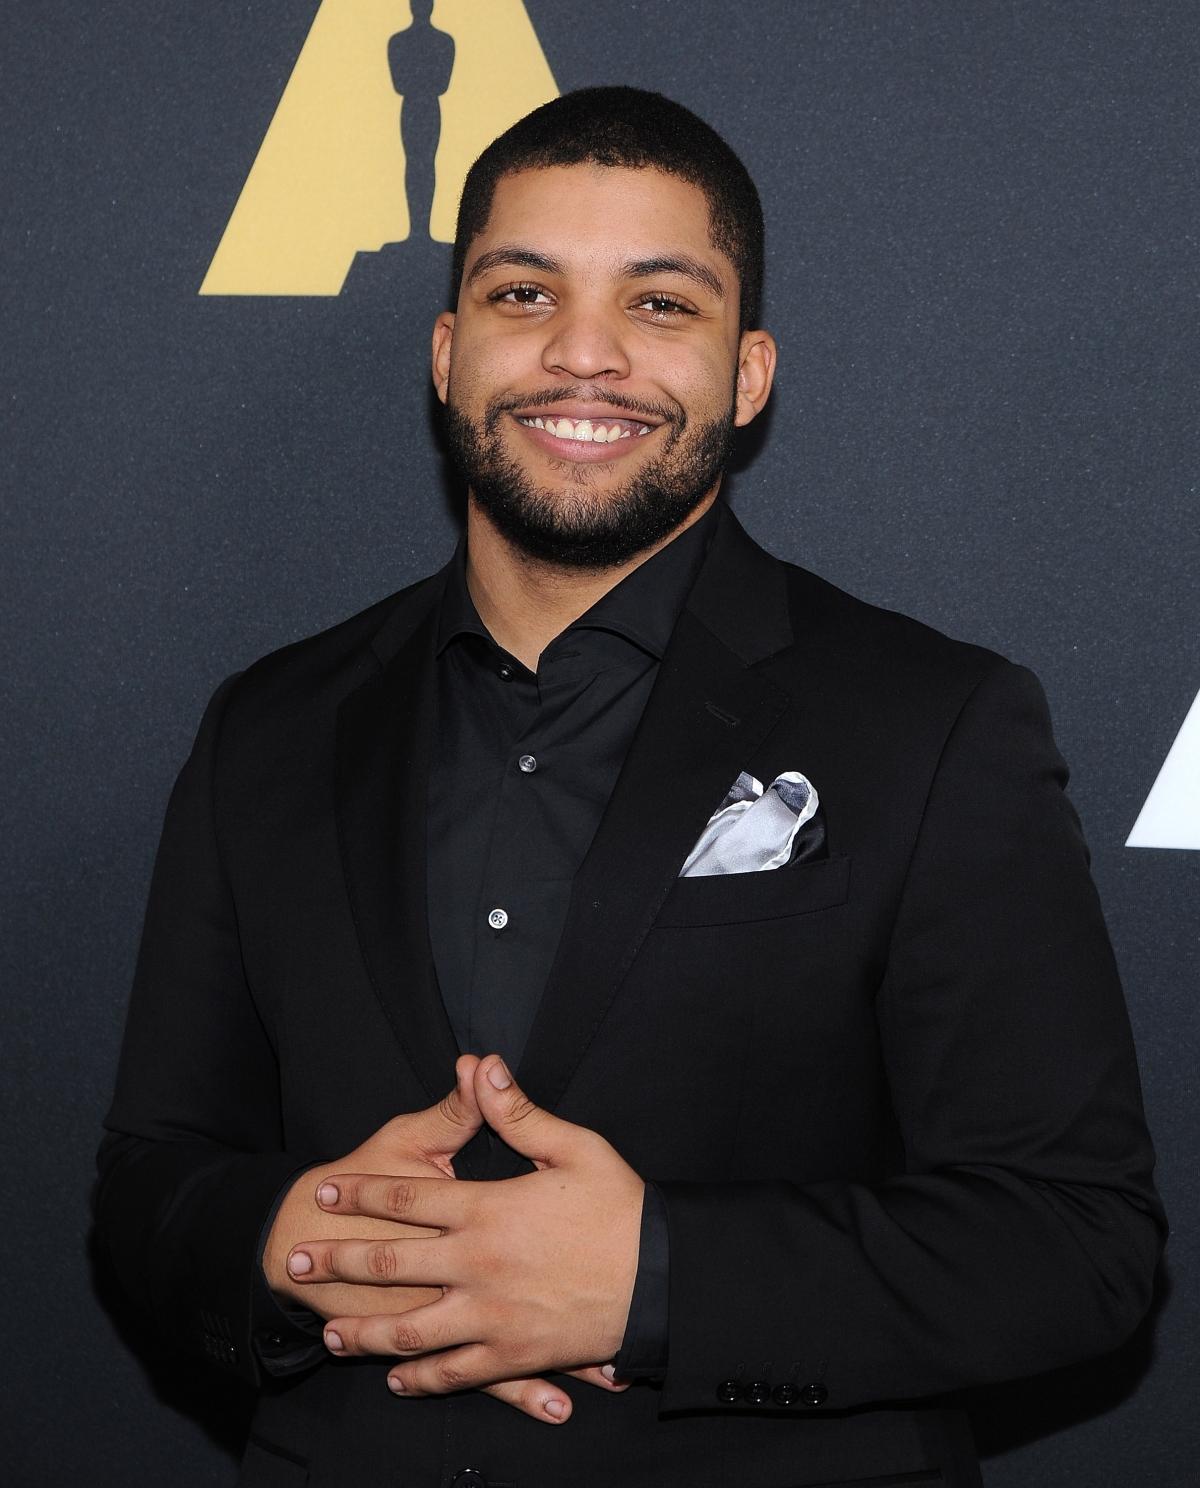 O'Shea Jackson Jr